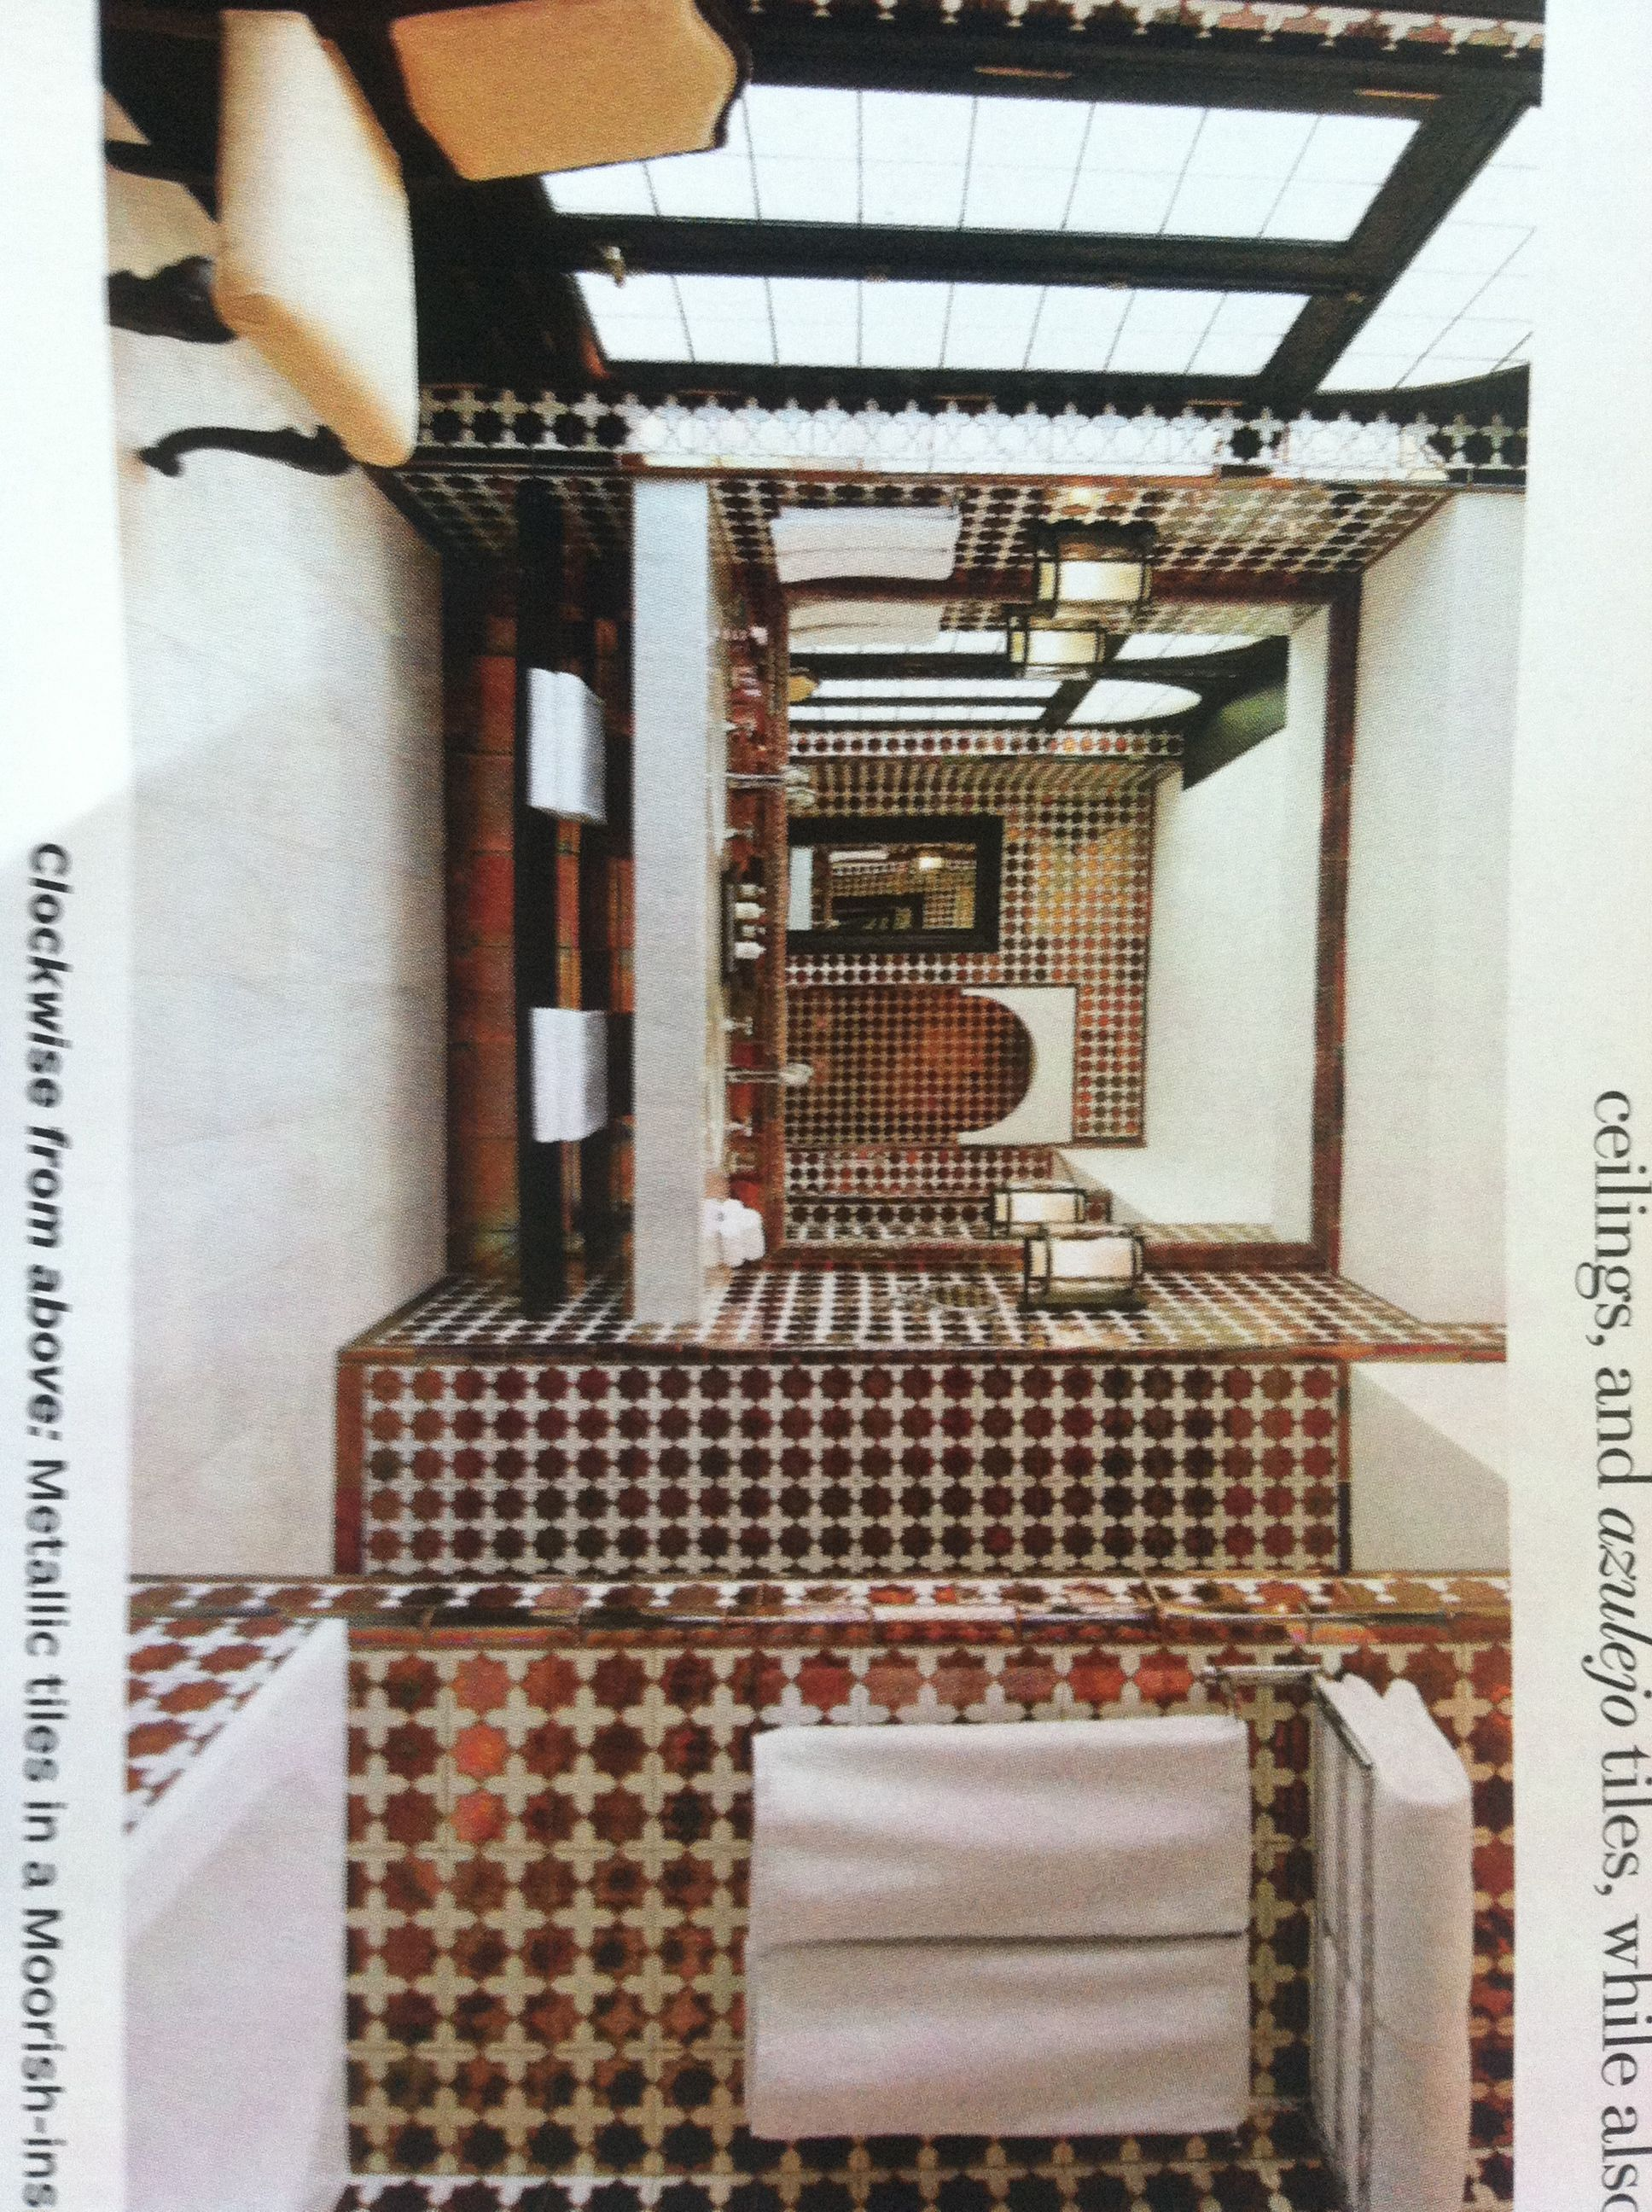 metallic tiles in a moorish-inspired pattern @ hotel alfonso xiii